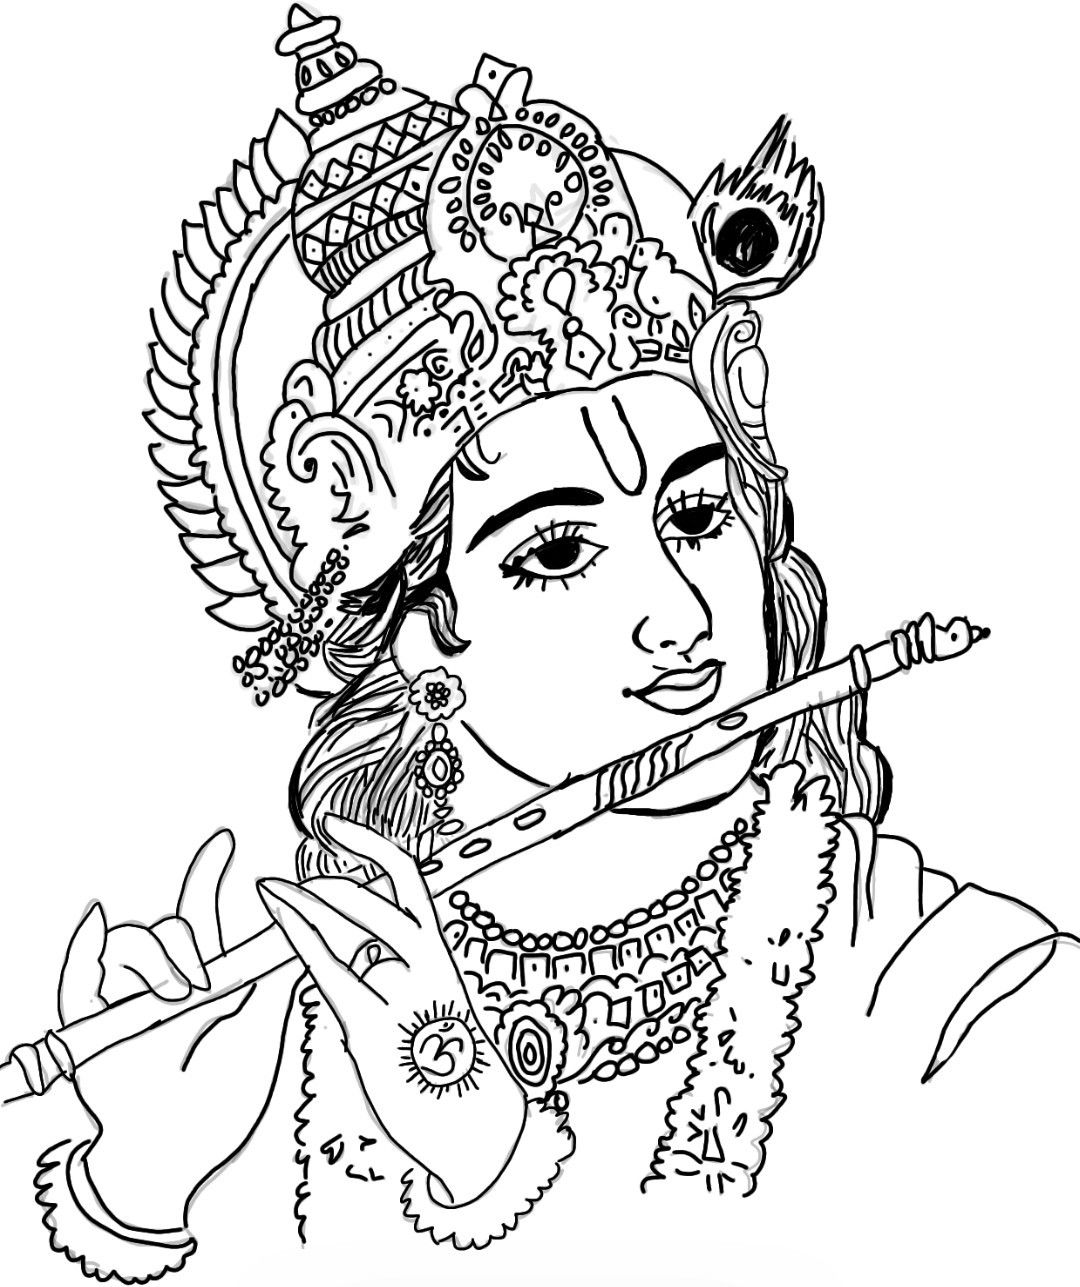 Krishna Digital Art Lord Krishna Sketch Drawings Art